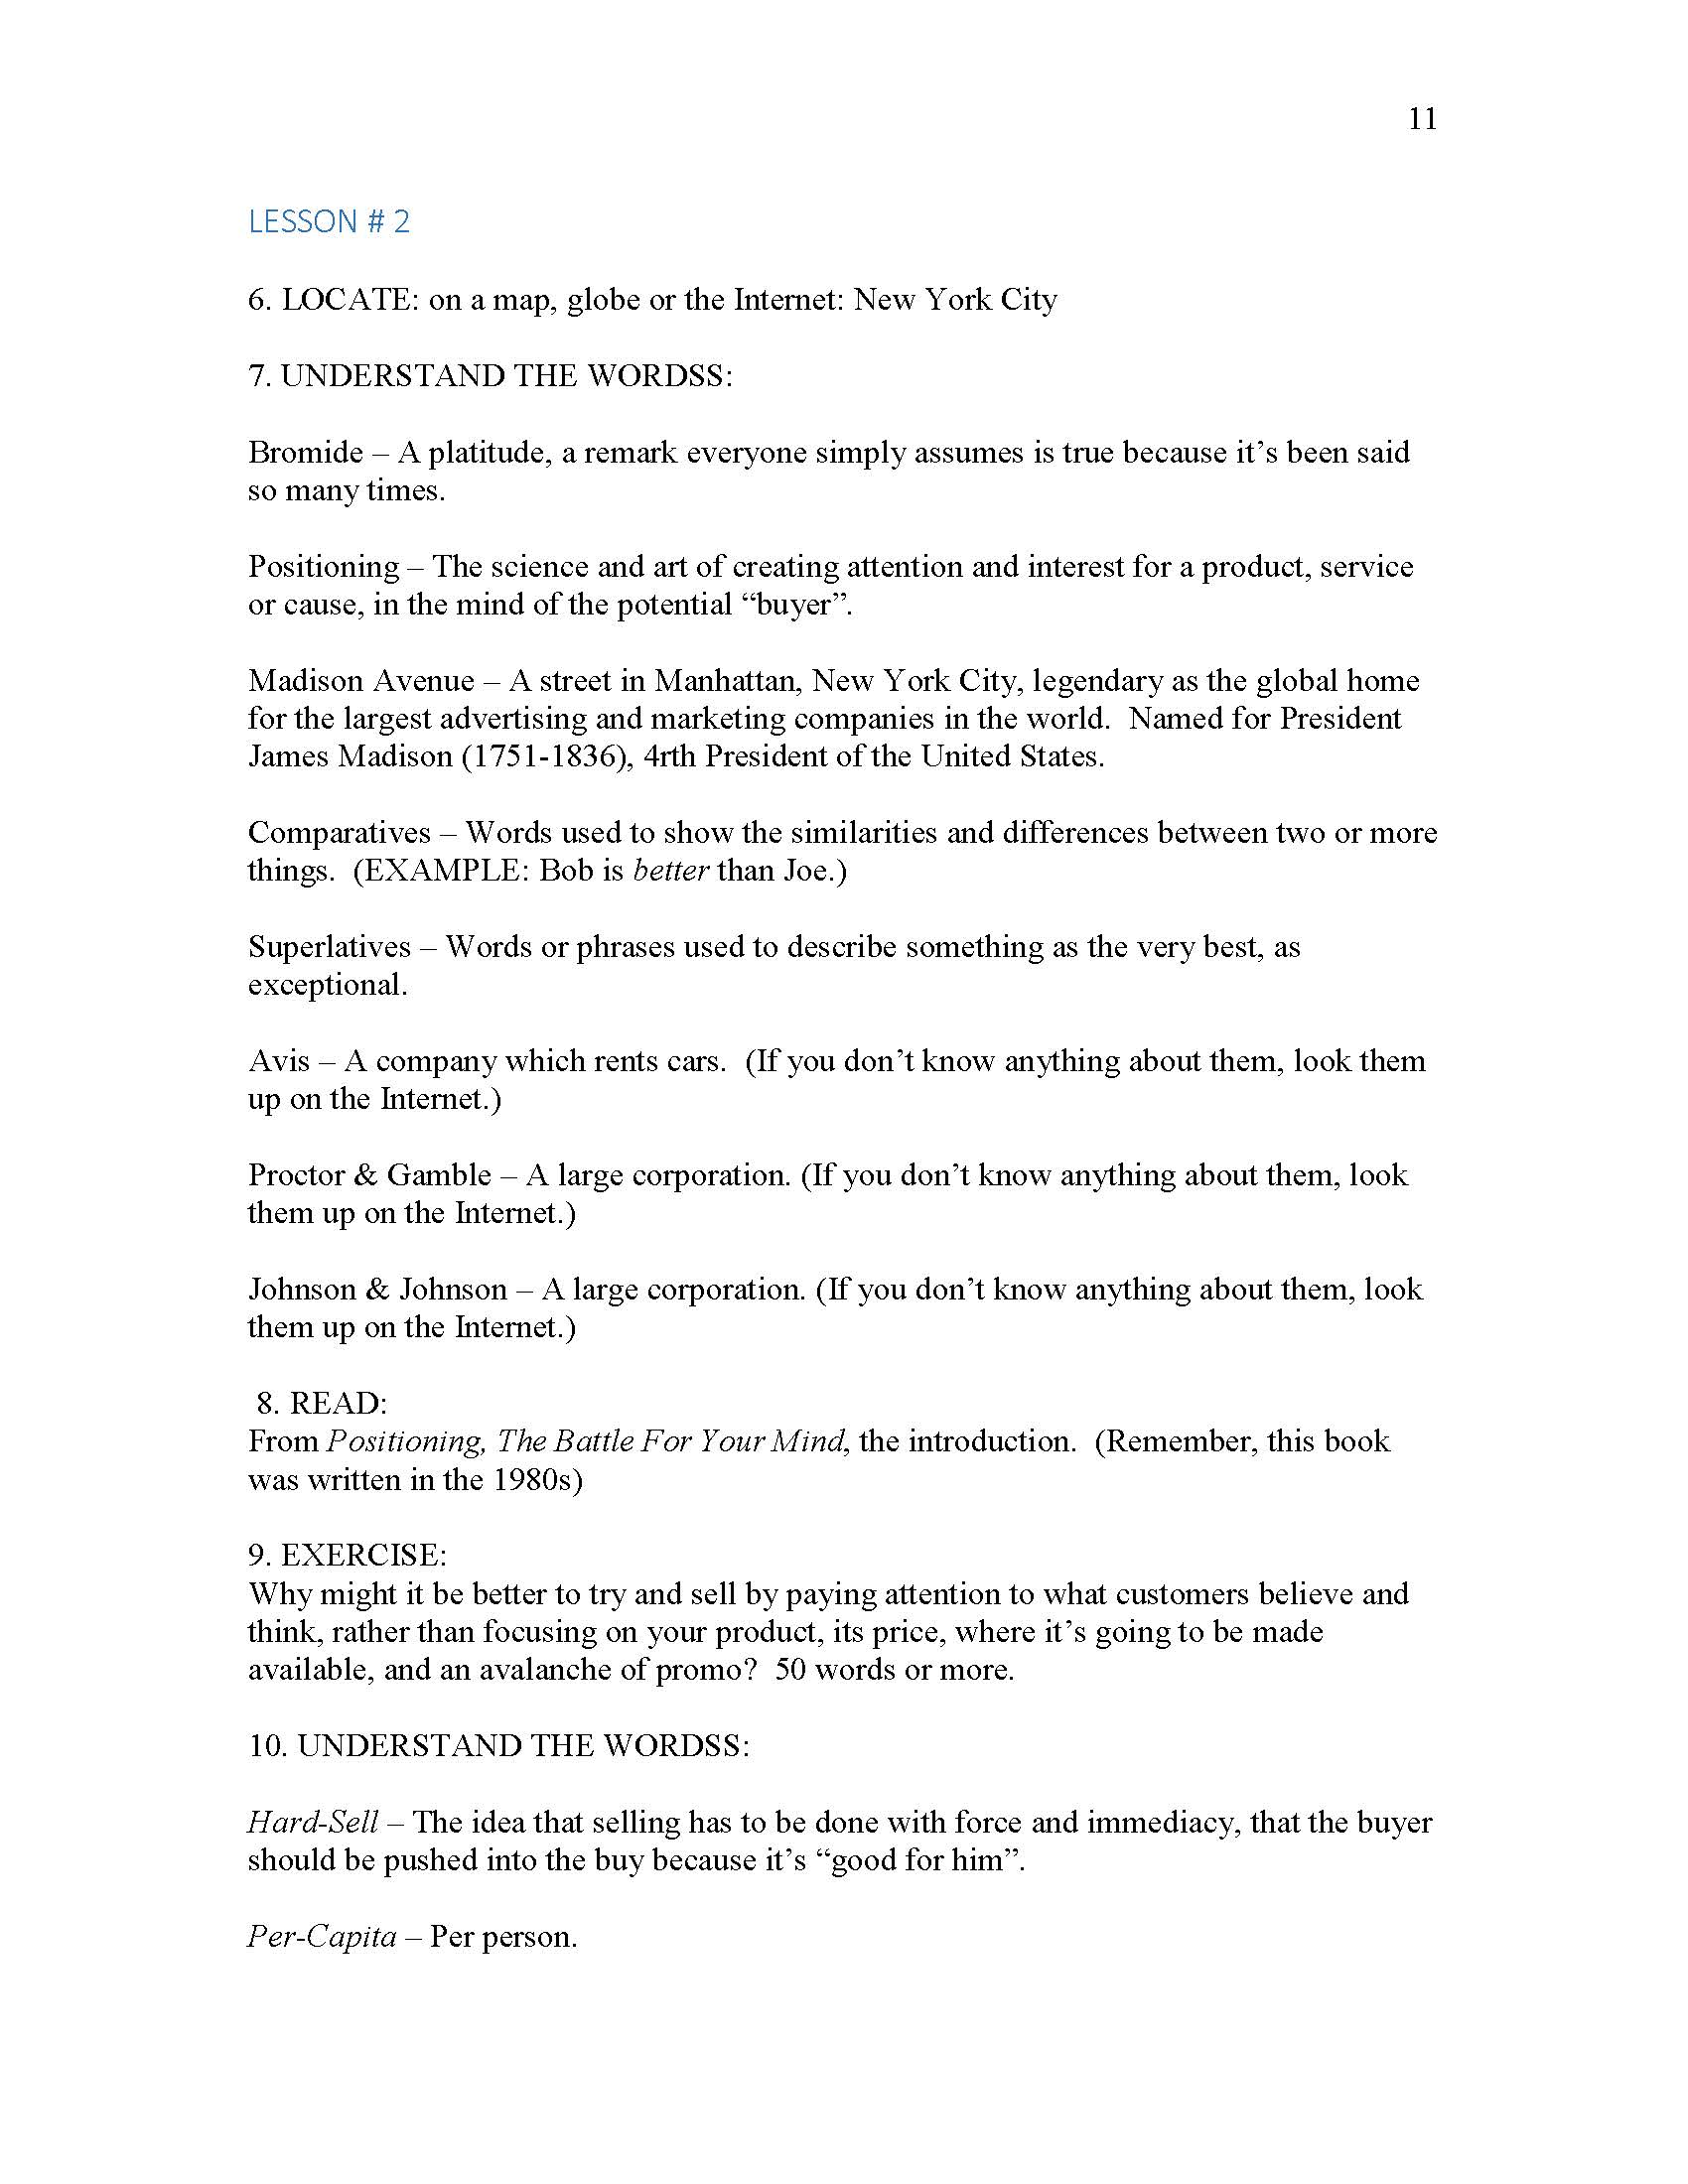 Step 4+ Creative Writing Master's Marketing & P.R._Page_012.jpg